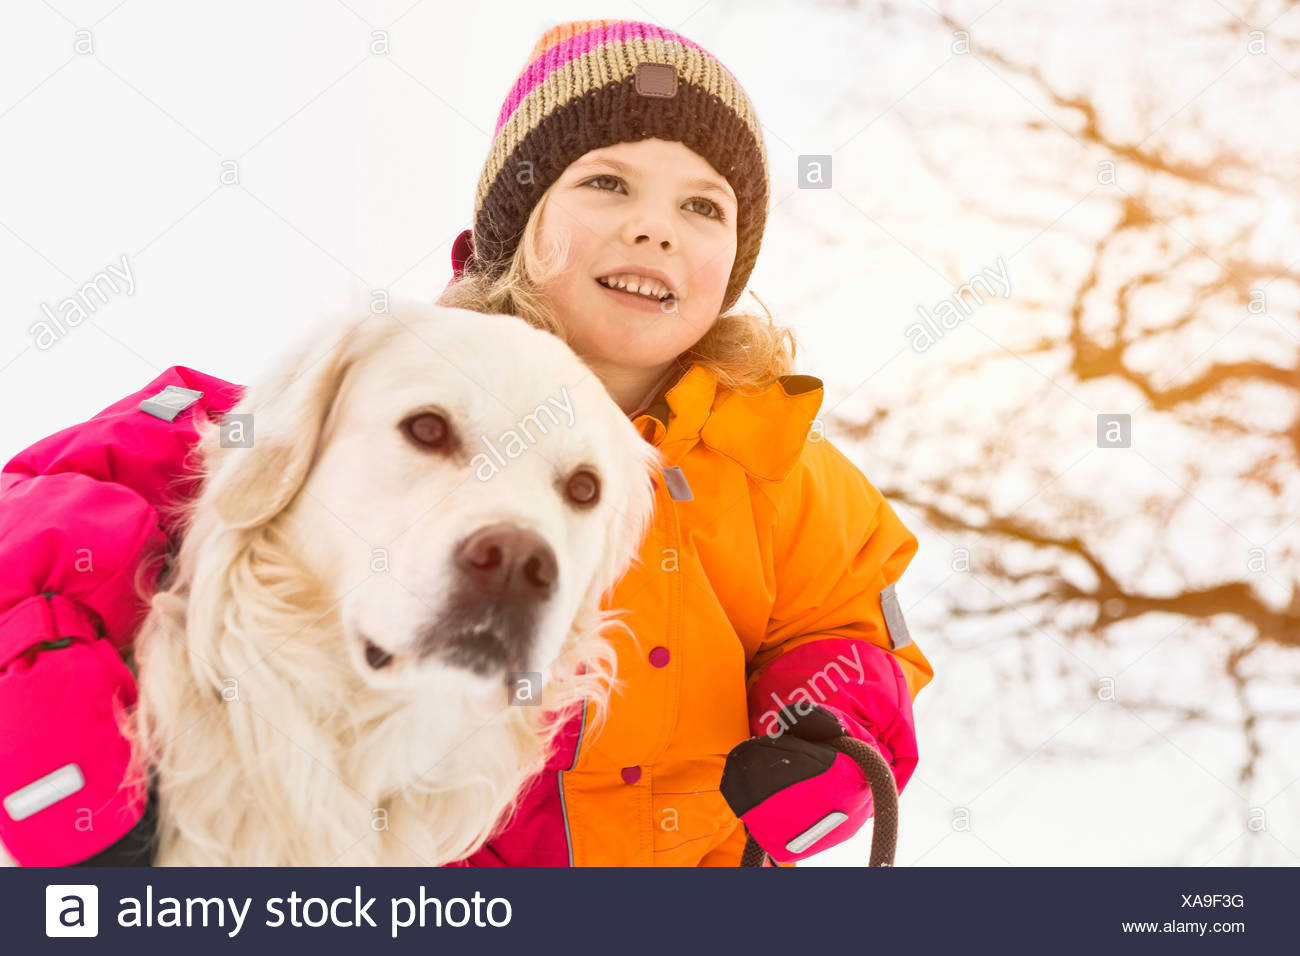 Girl with arm around dog - Stock Image